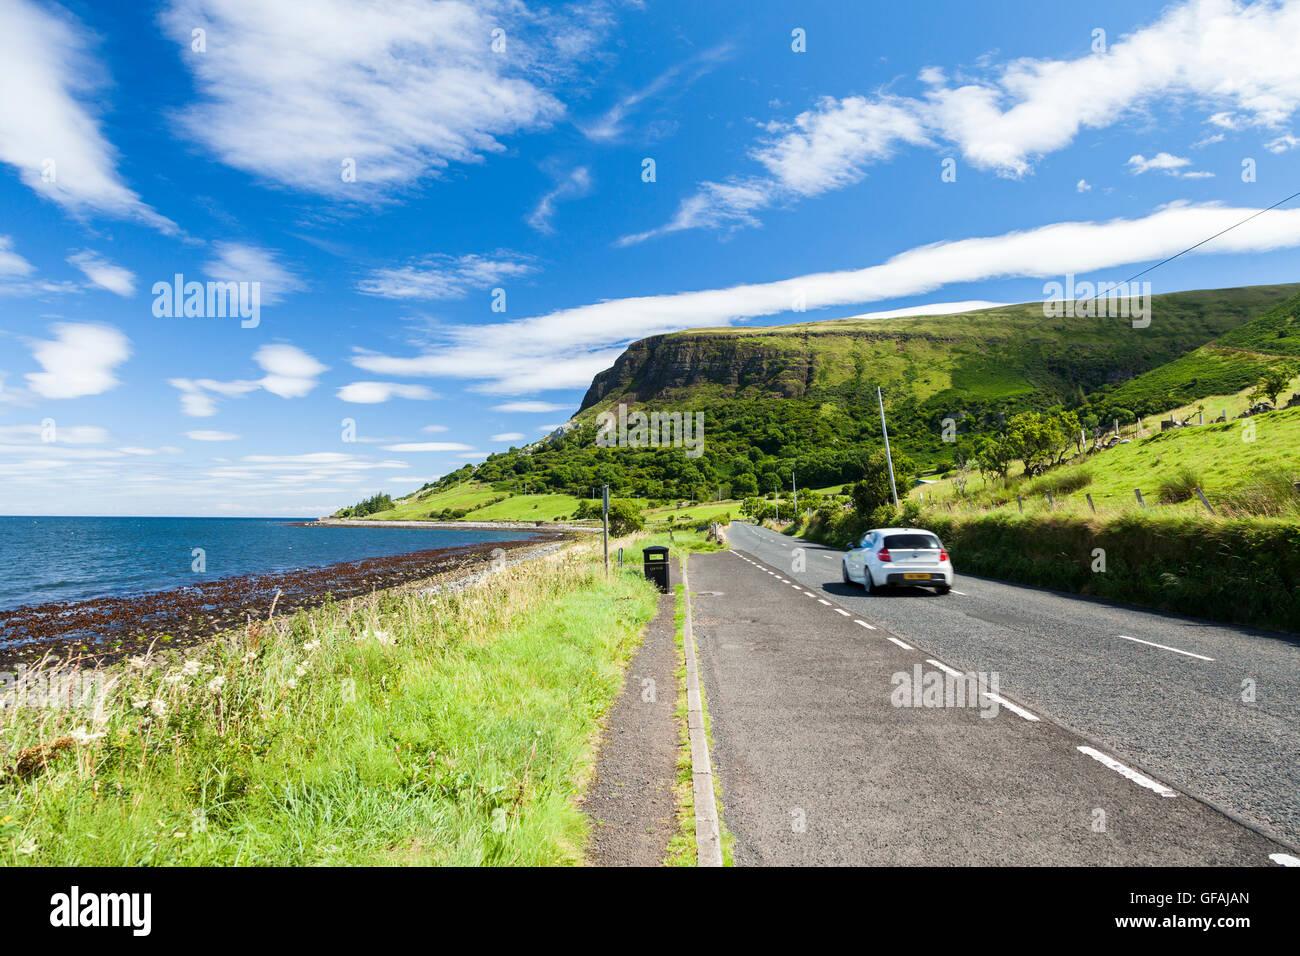 Antrim Coast, Northern Ireland, UK, 29th July 2016. UK weather: A day of glorious sunshine on the North Antrim Coast Stock Photo